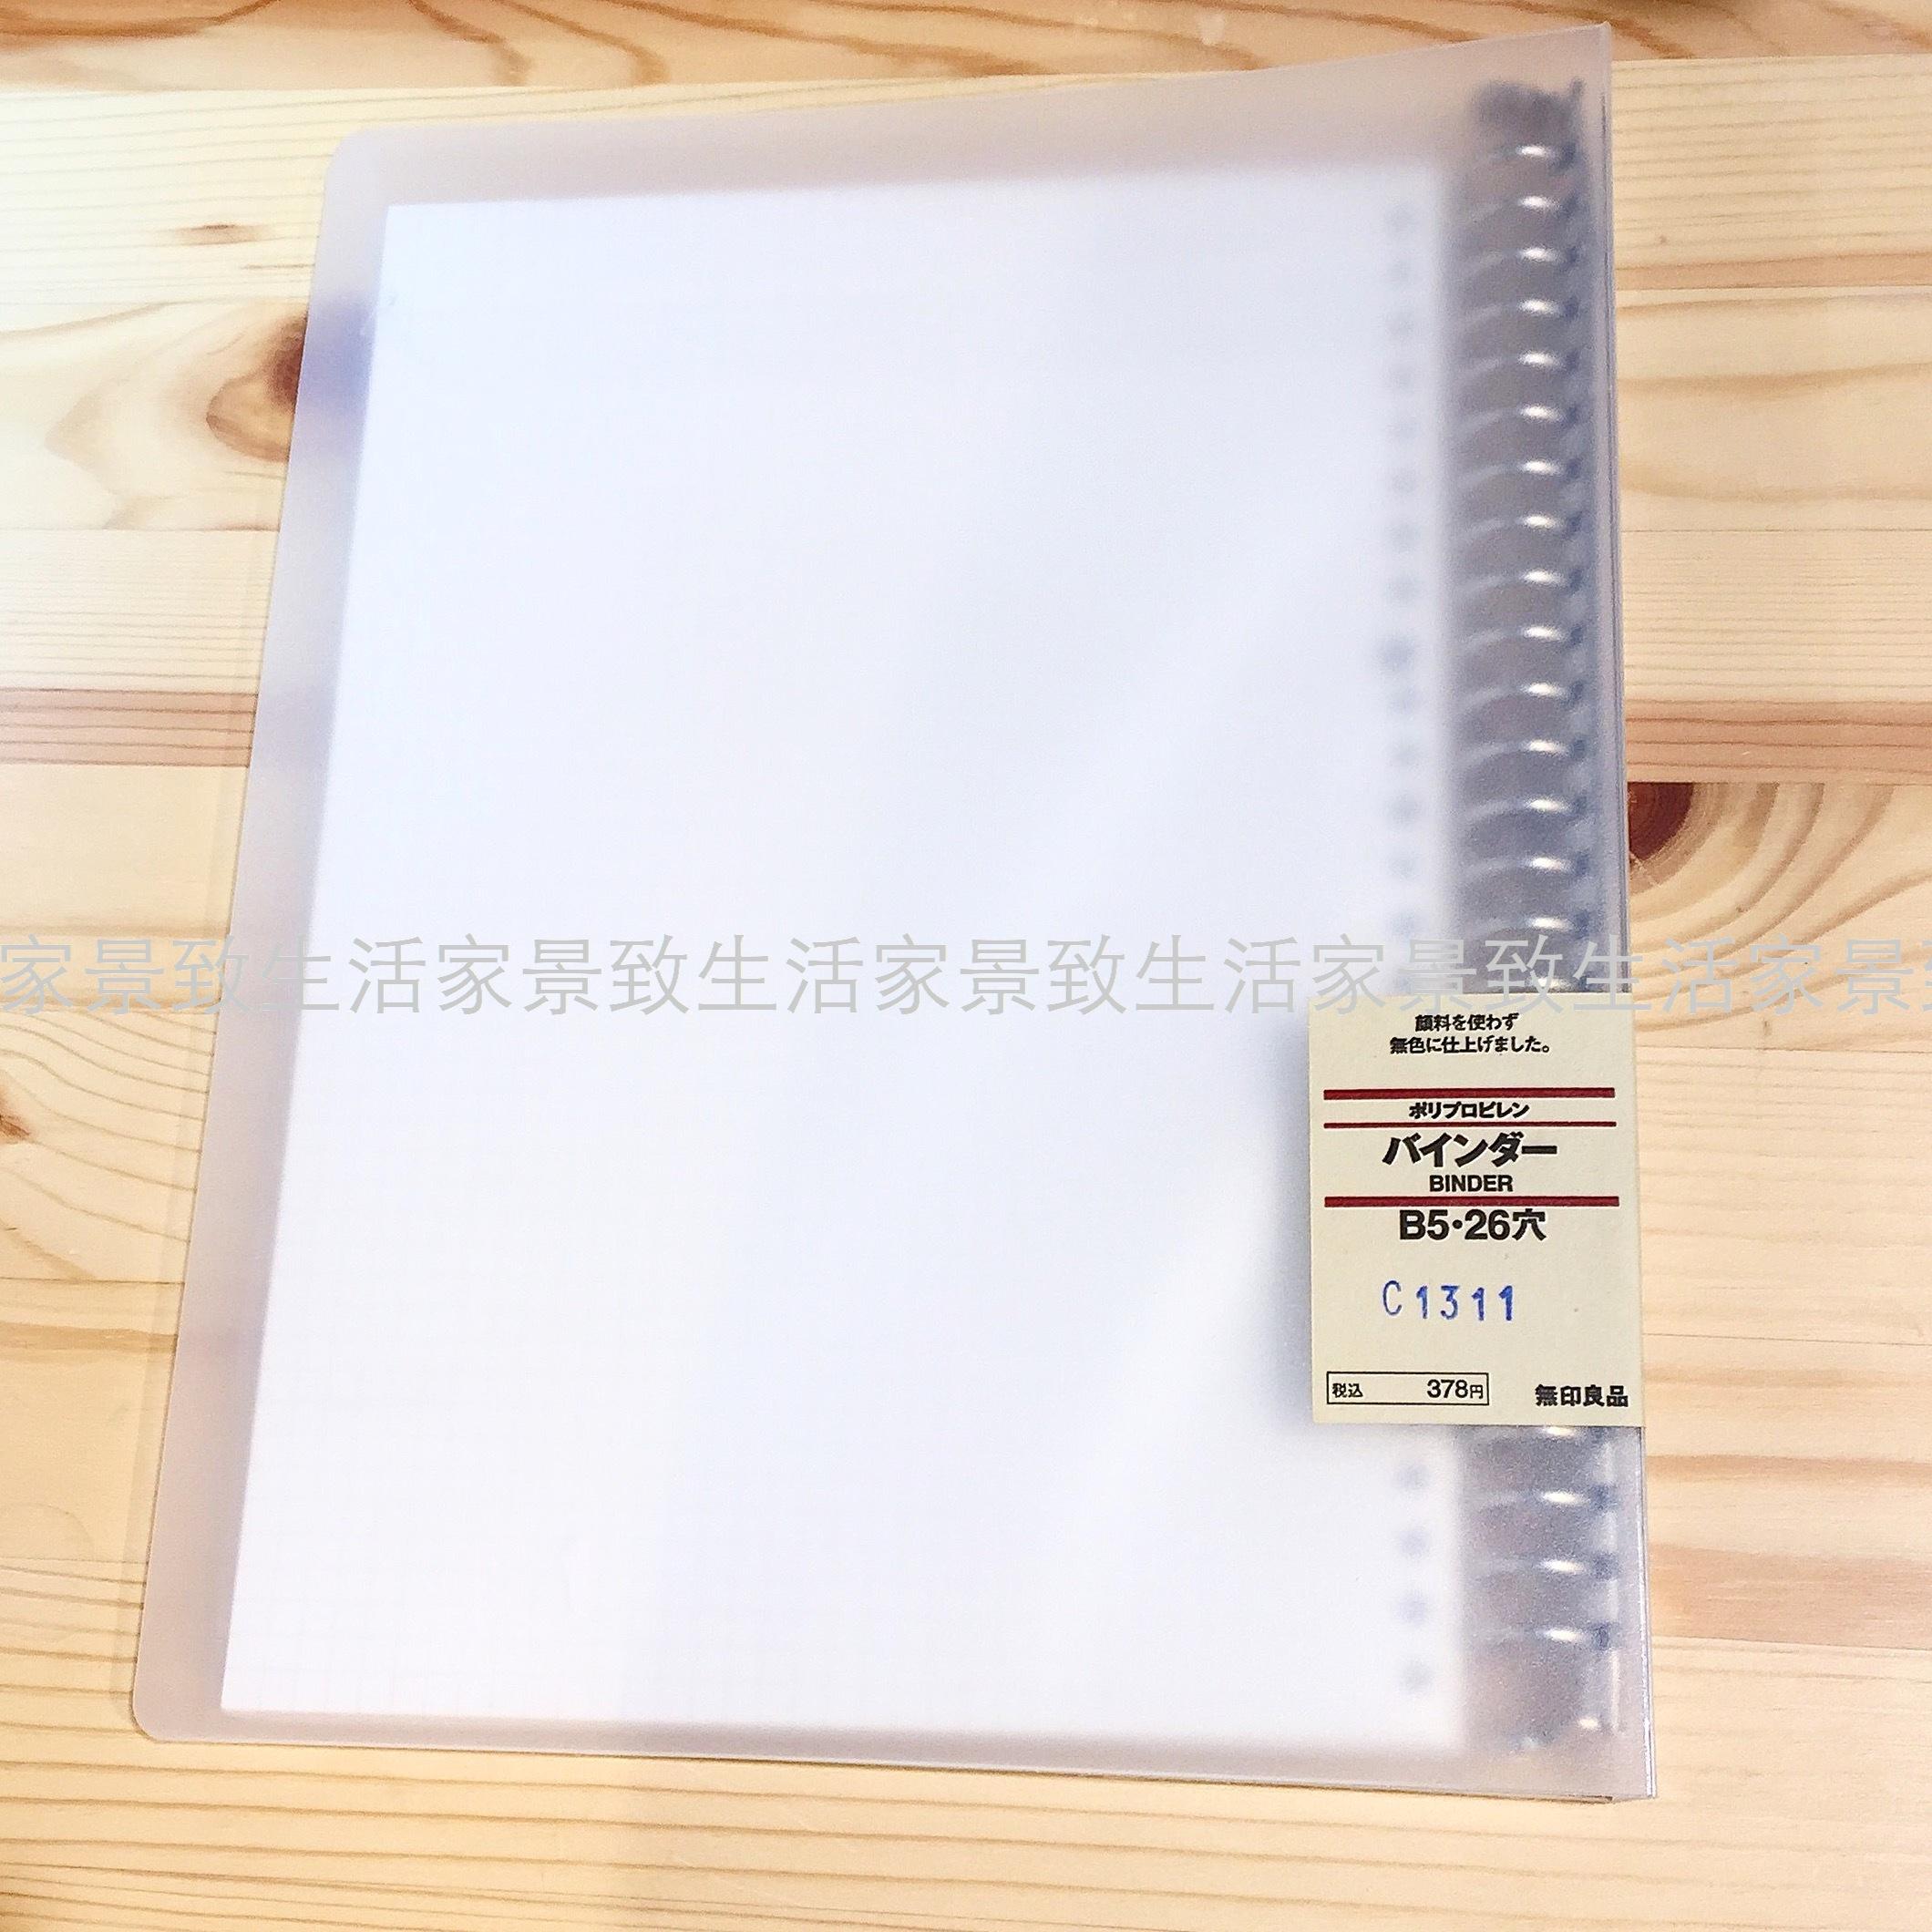 Muji Muji Loose-leaf Paper Multi-hole Binder Replacement